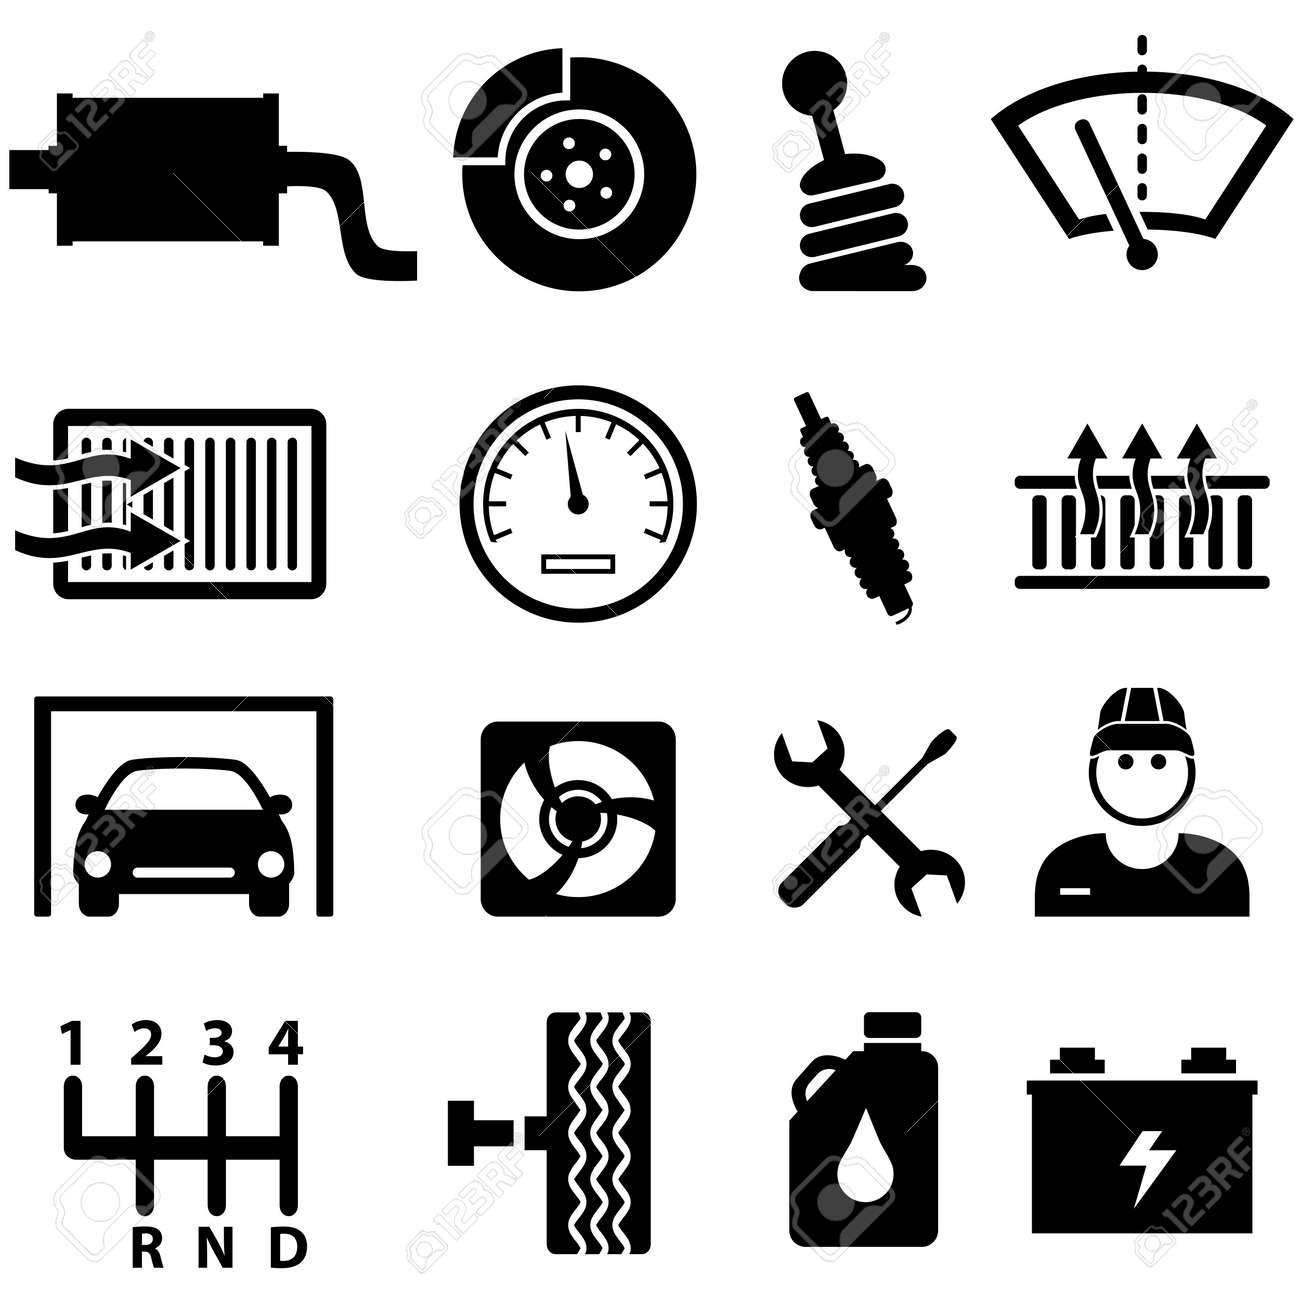 Car repair shop and mechanic icon set - 26264613